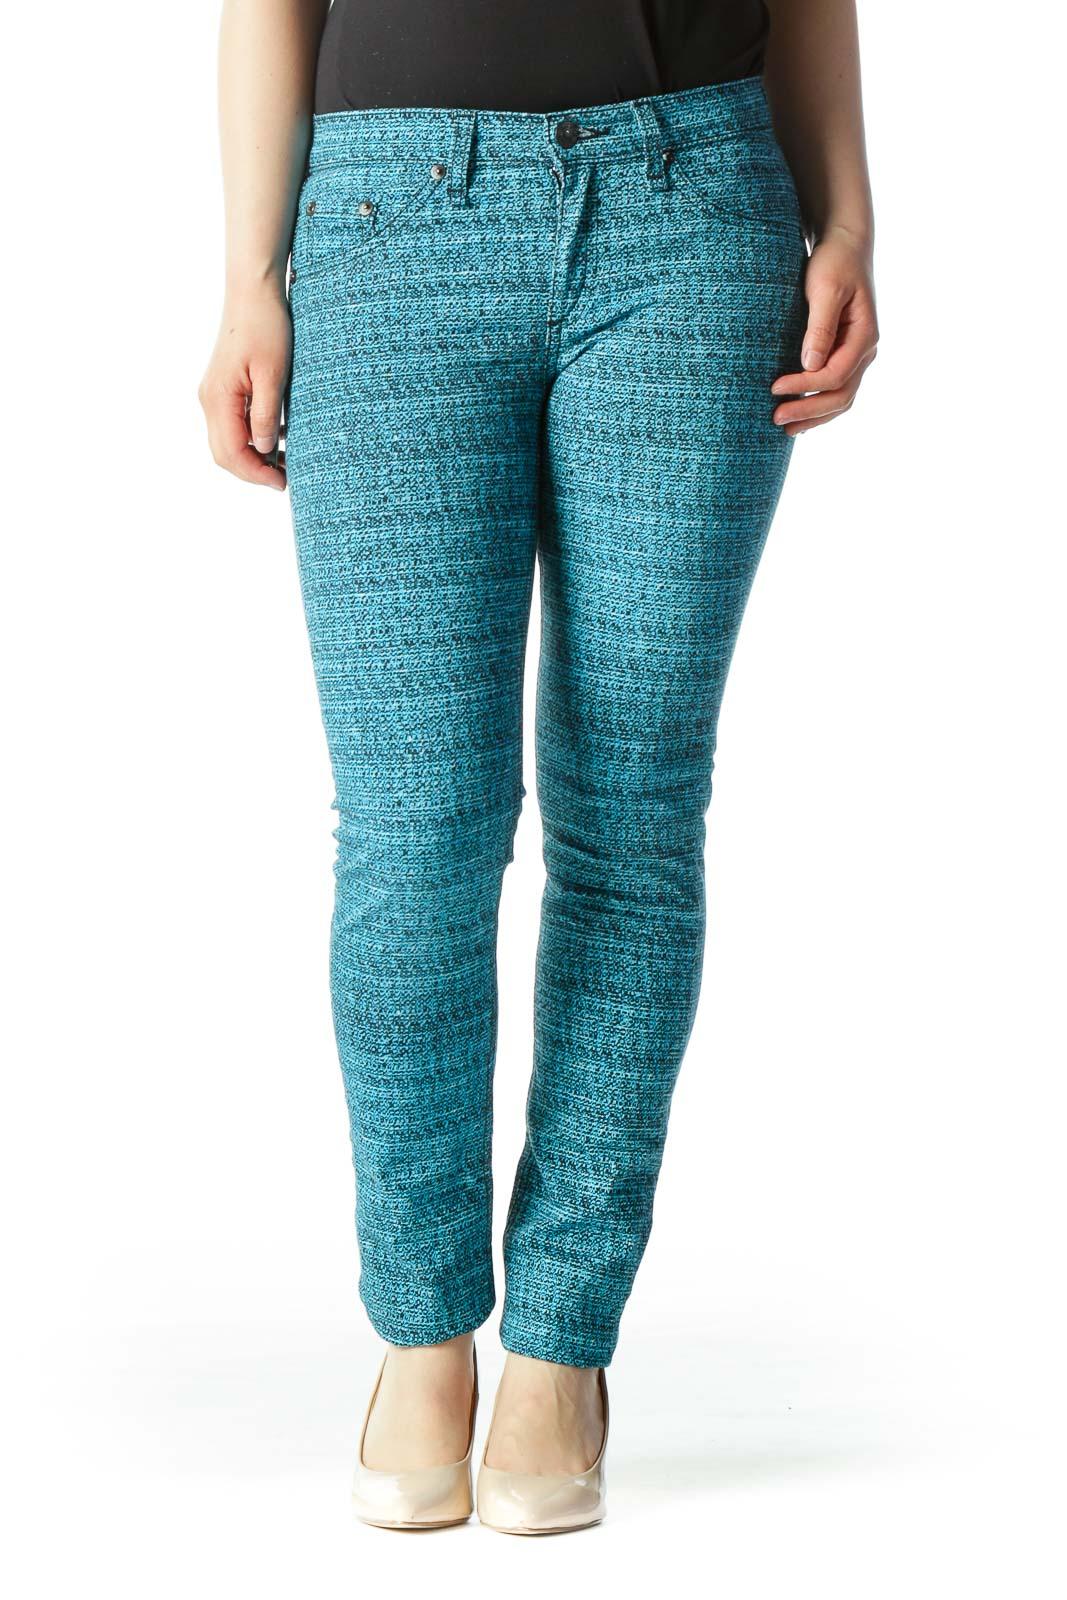 Teal Printed Skinny Pant Front